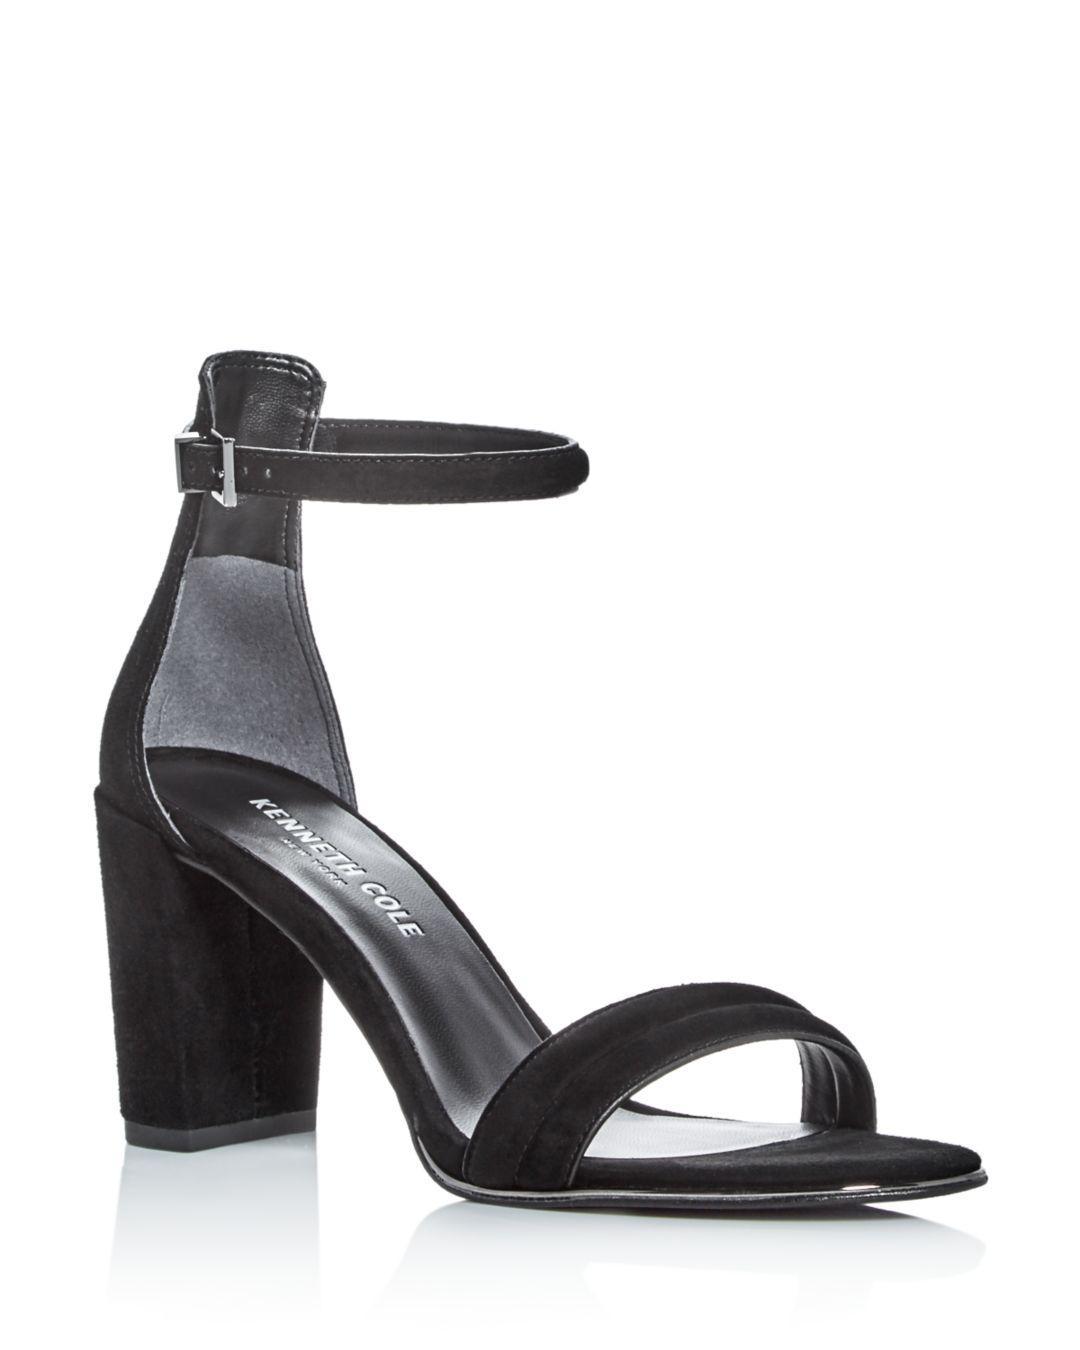 620c33abee3 Kenneth Cole - Black Lex Ankle Strap Block Heel Sandals - Lyst. View  fullscreen